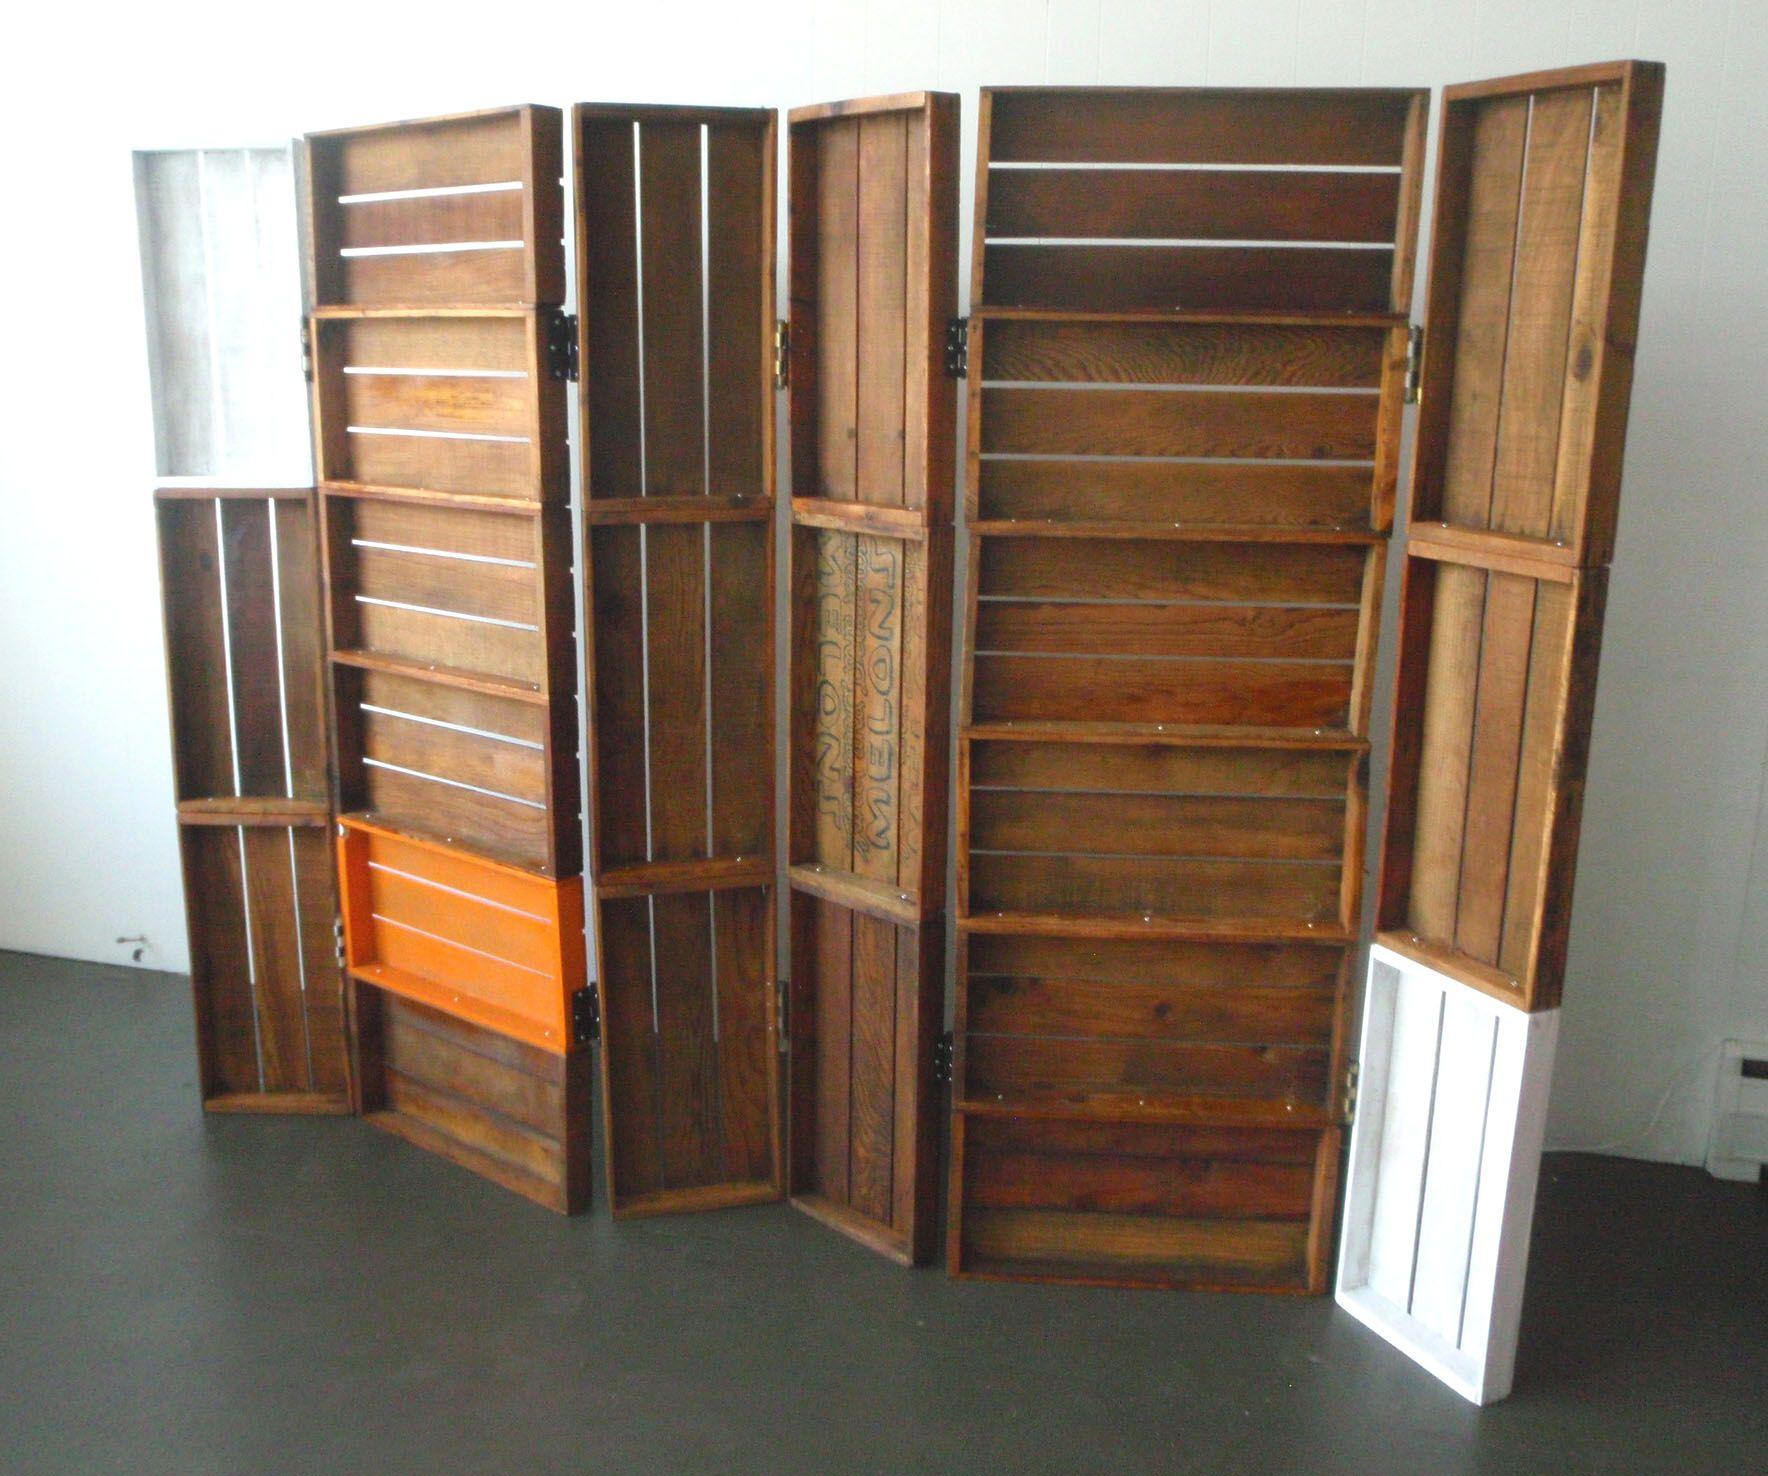 Palette Room Divider 2 Outdoor Stuff Bookshelf